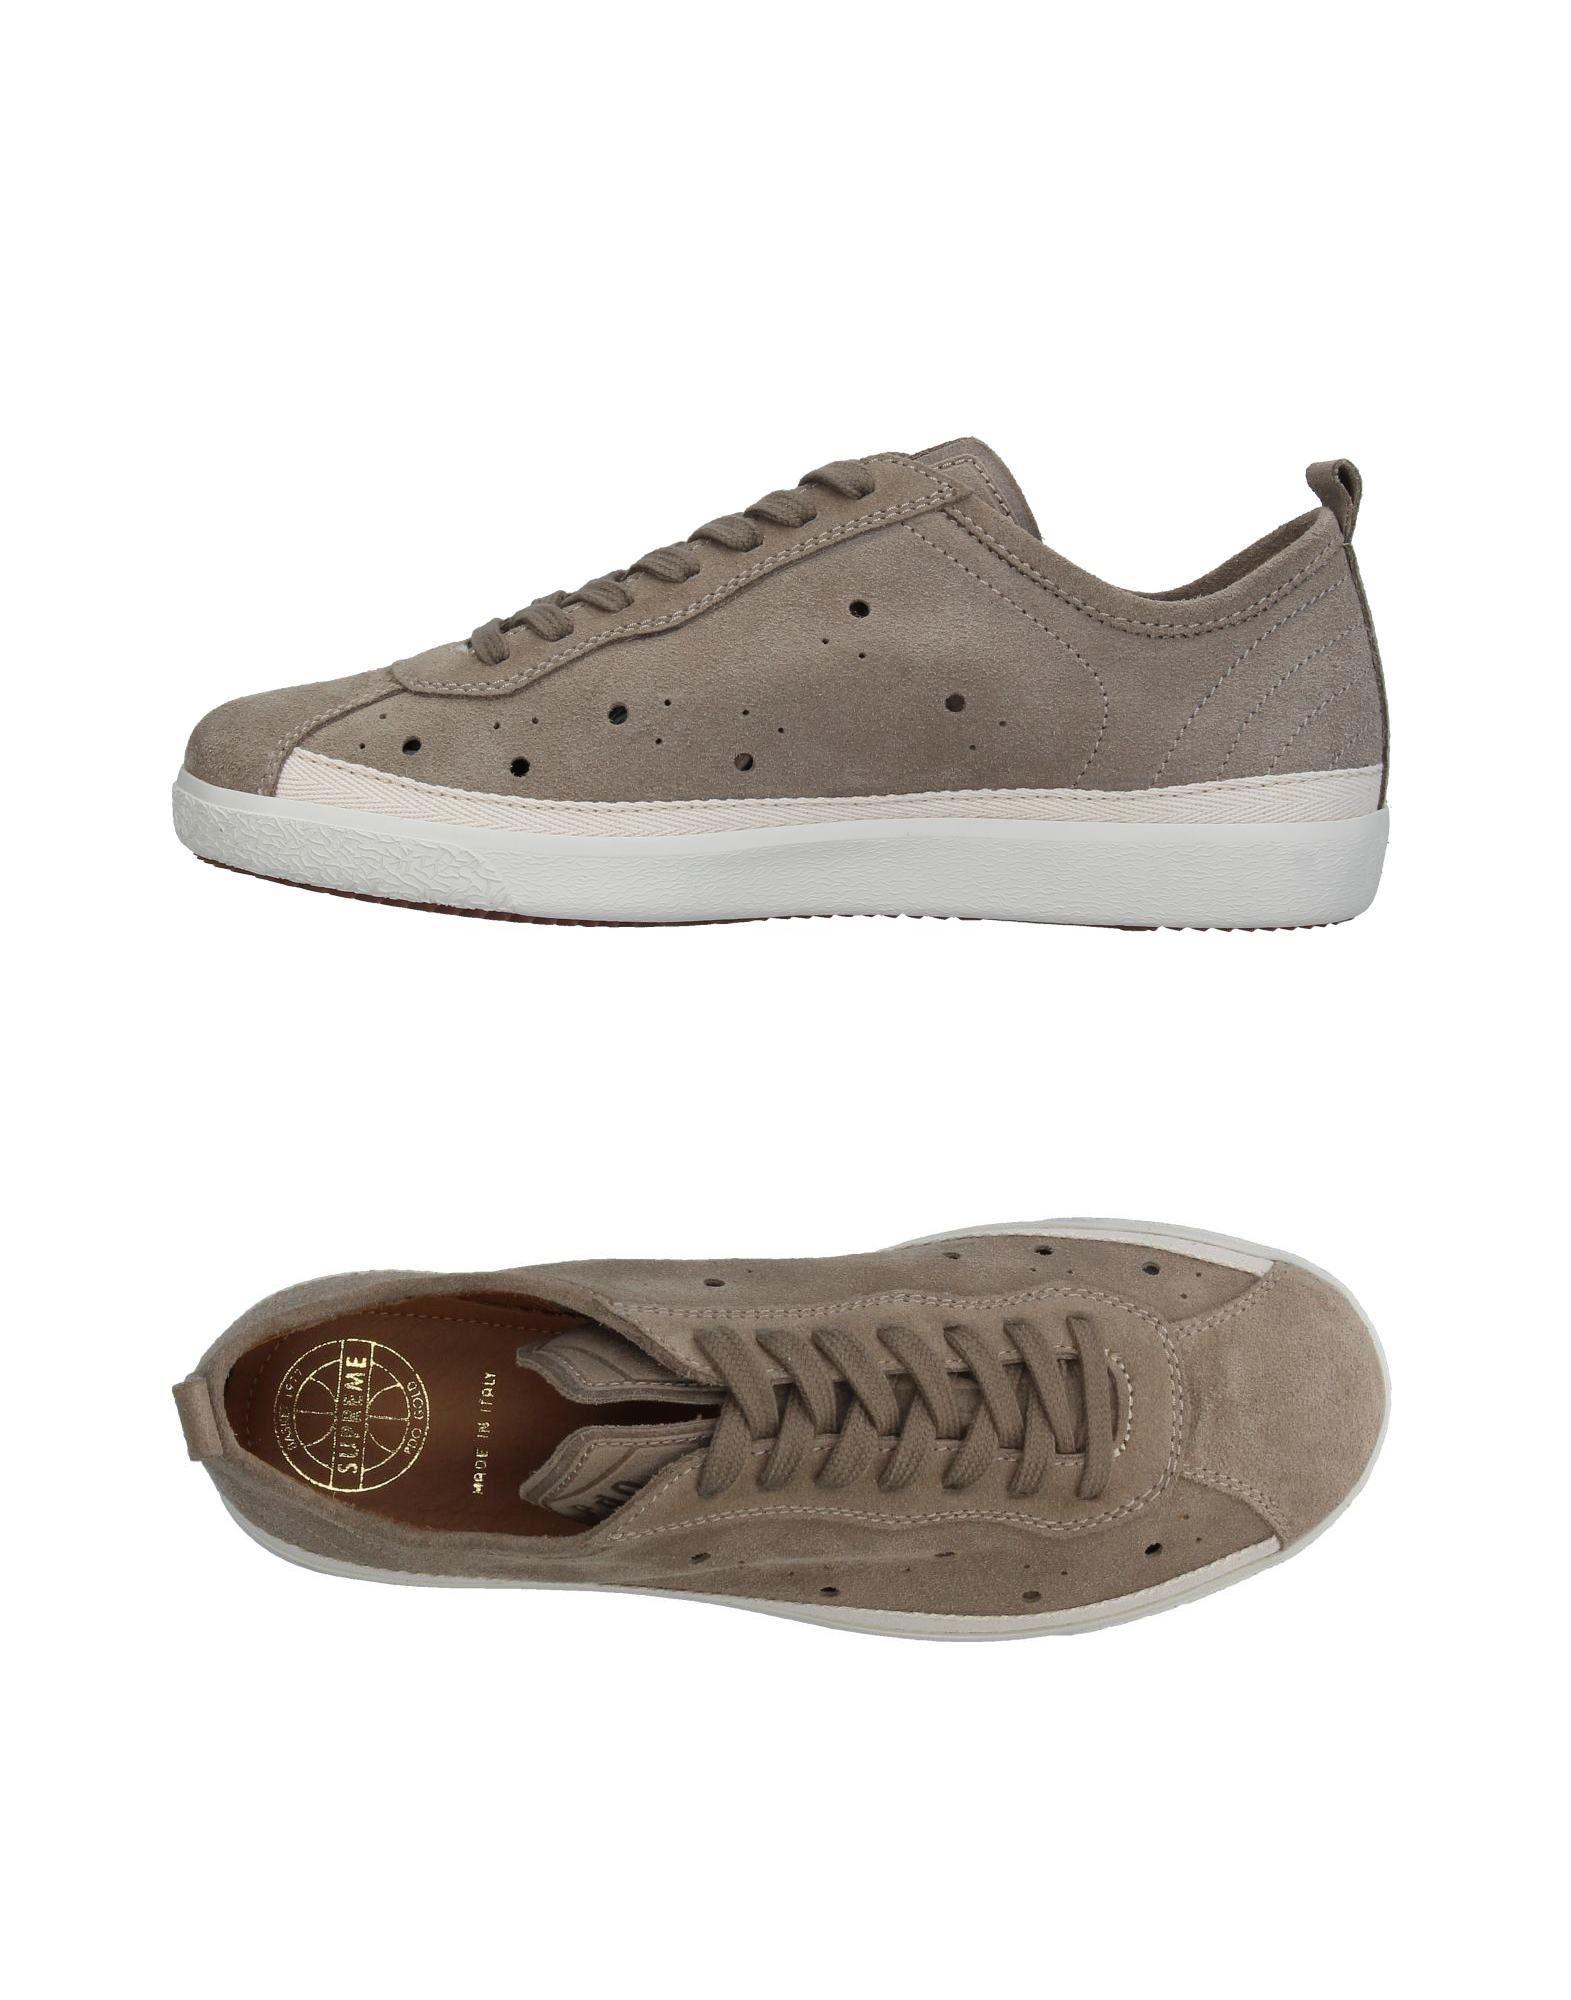 Rabatt echte Schuhe Pantofola D'oro Sneakers Herren  11339003GI